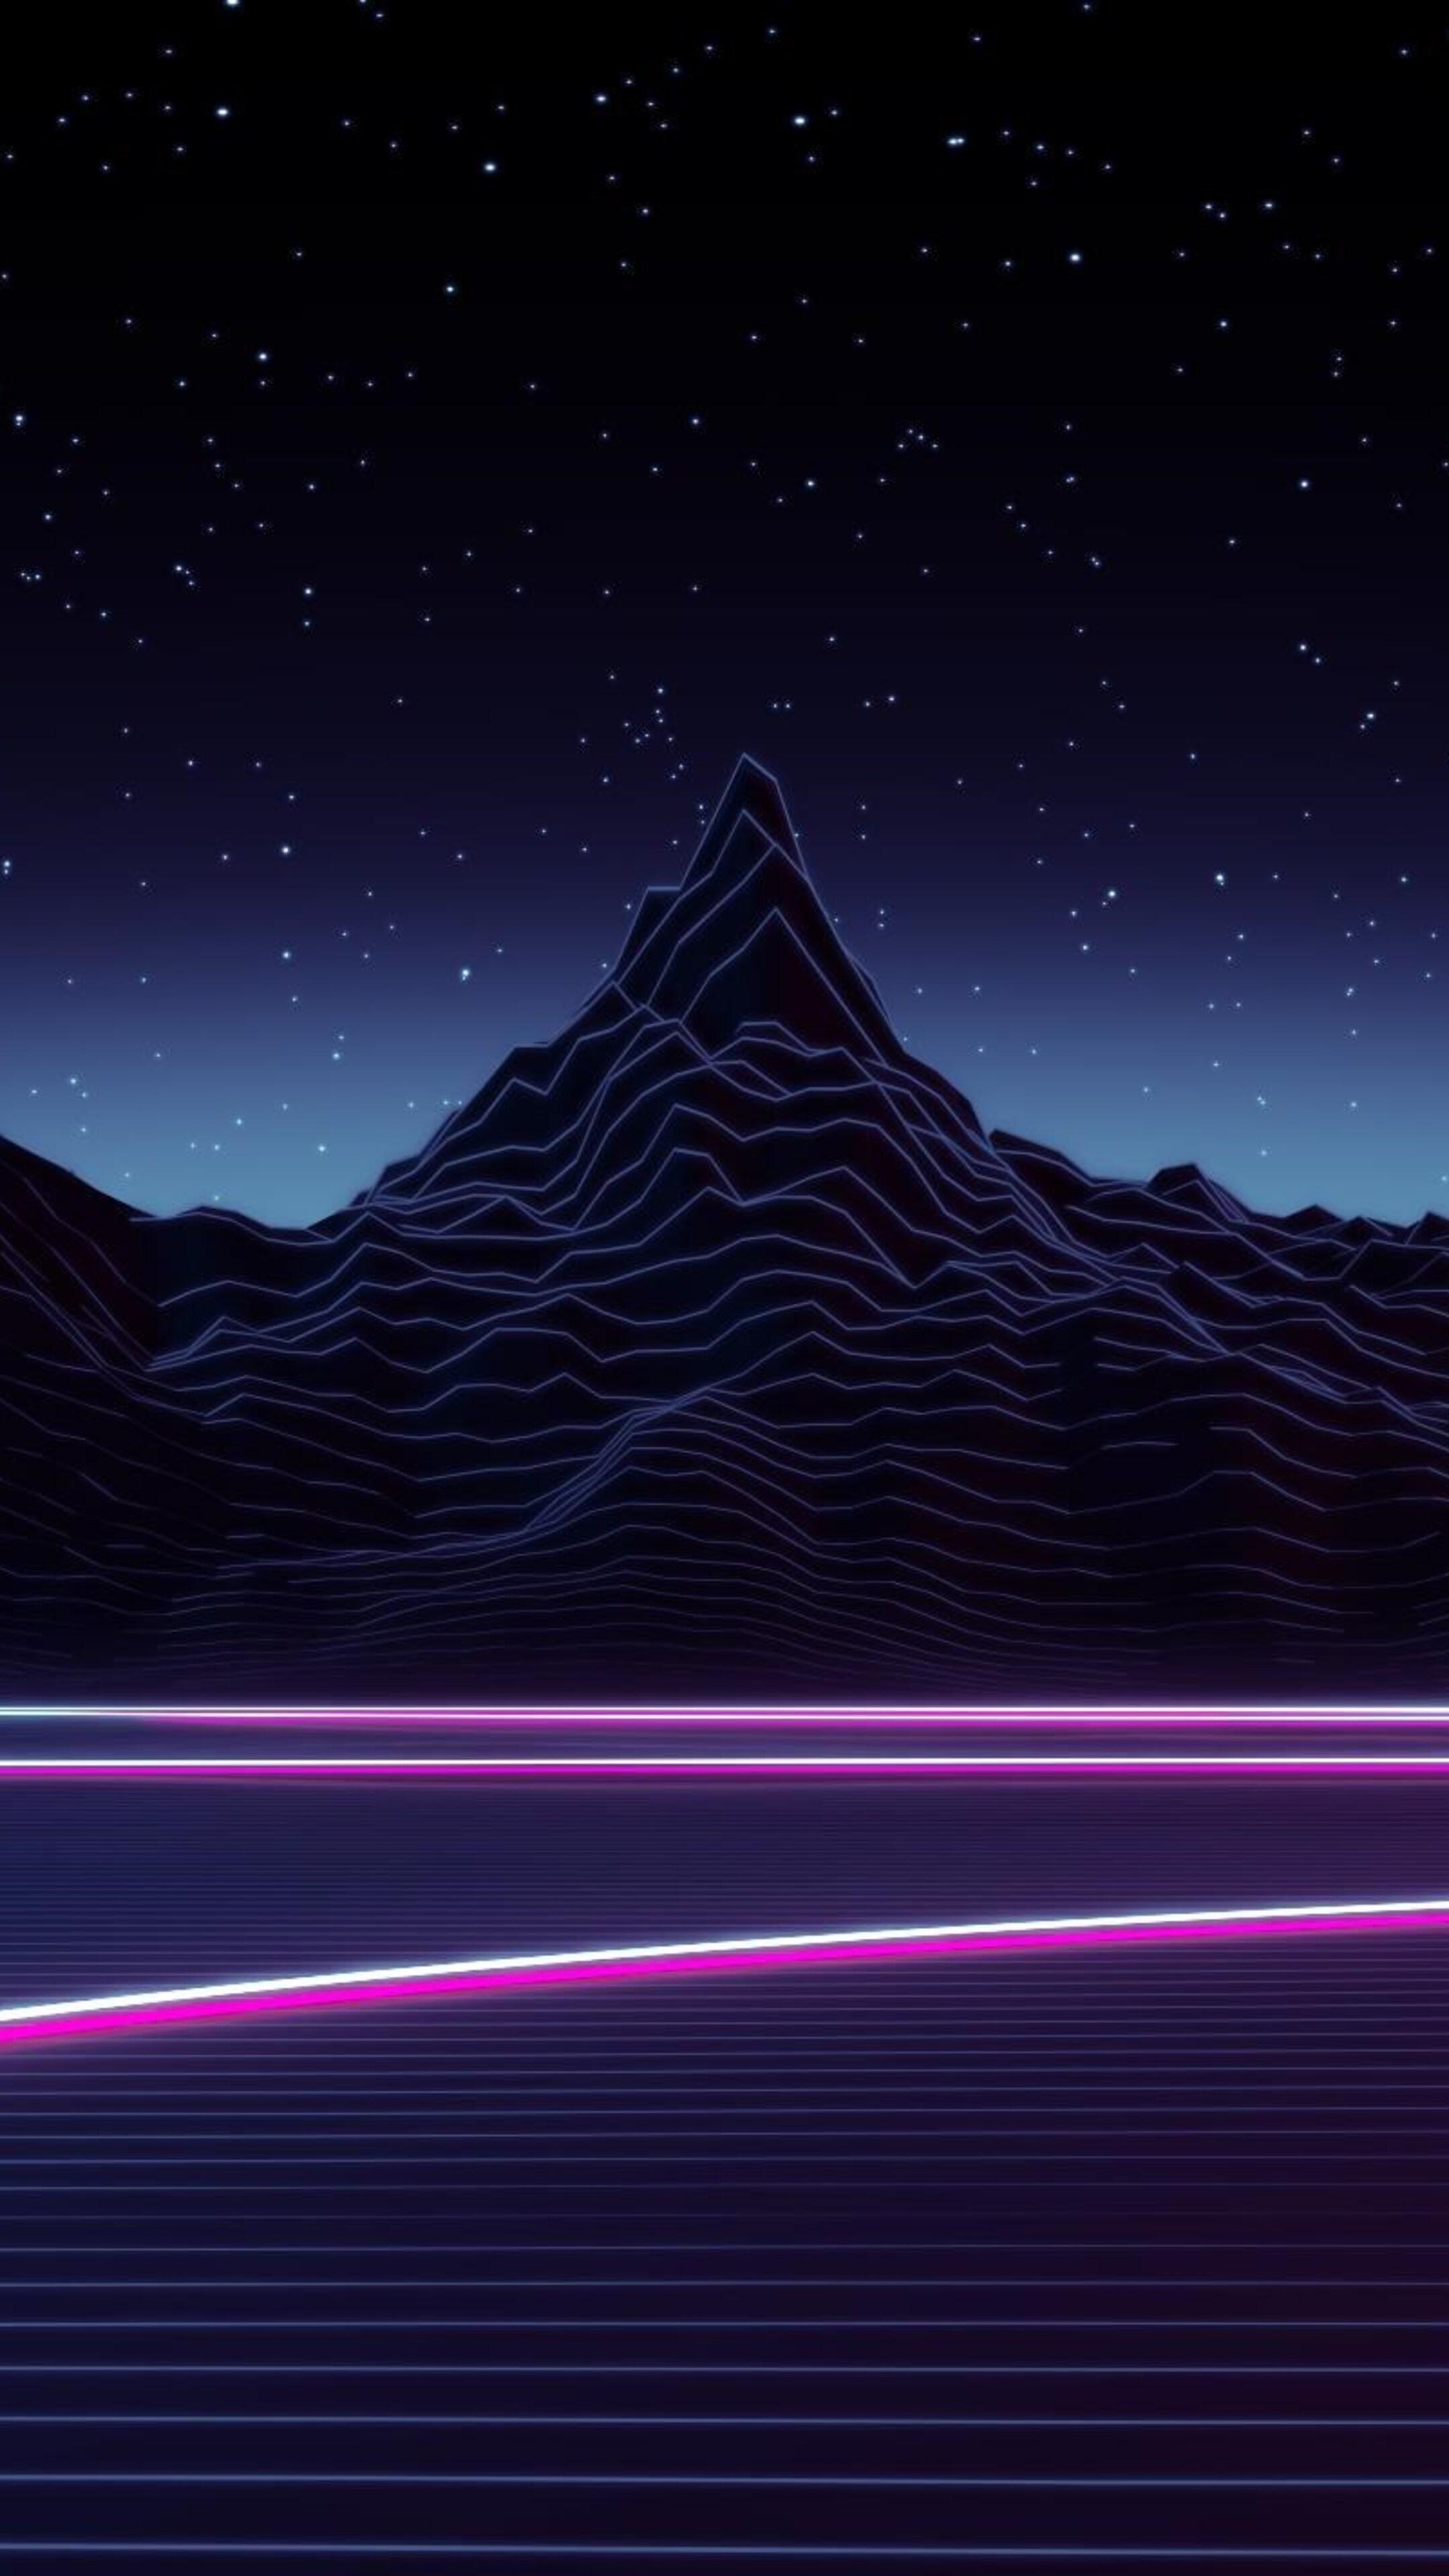 2160x3840 neon highway digital art sony xperia x xz z5 - Art wallpaper 2160x3840 ...